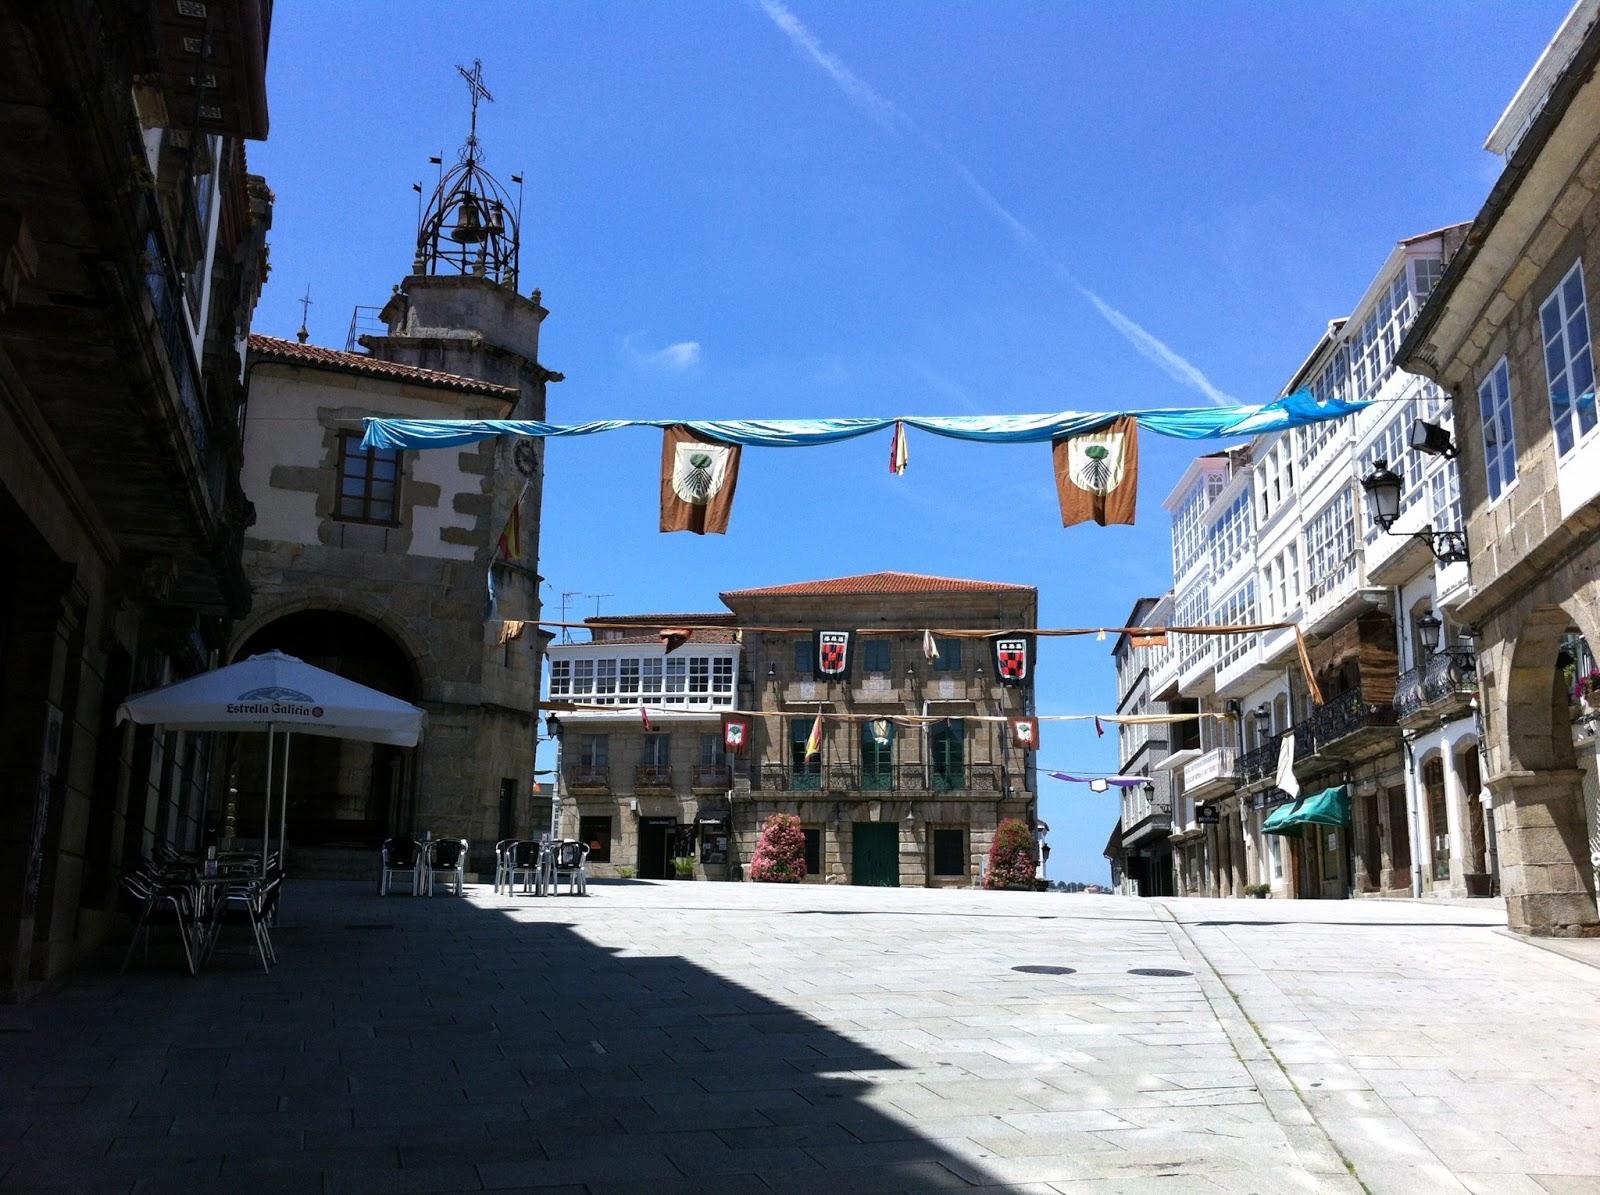 Betanzos Spain  City new picture : DESDE MI VENTANA: BETANZOS, LA CORUÑA. SPAIN